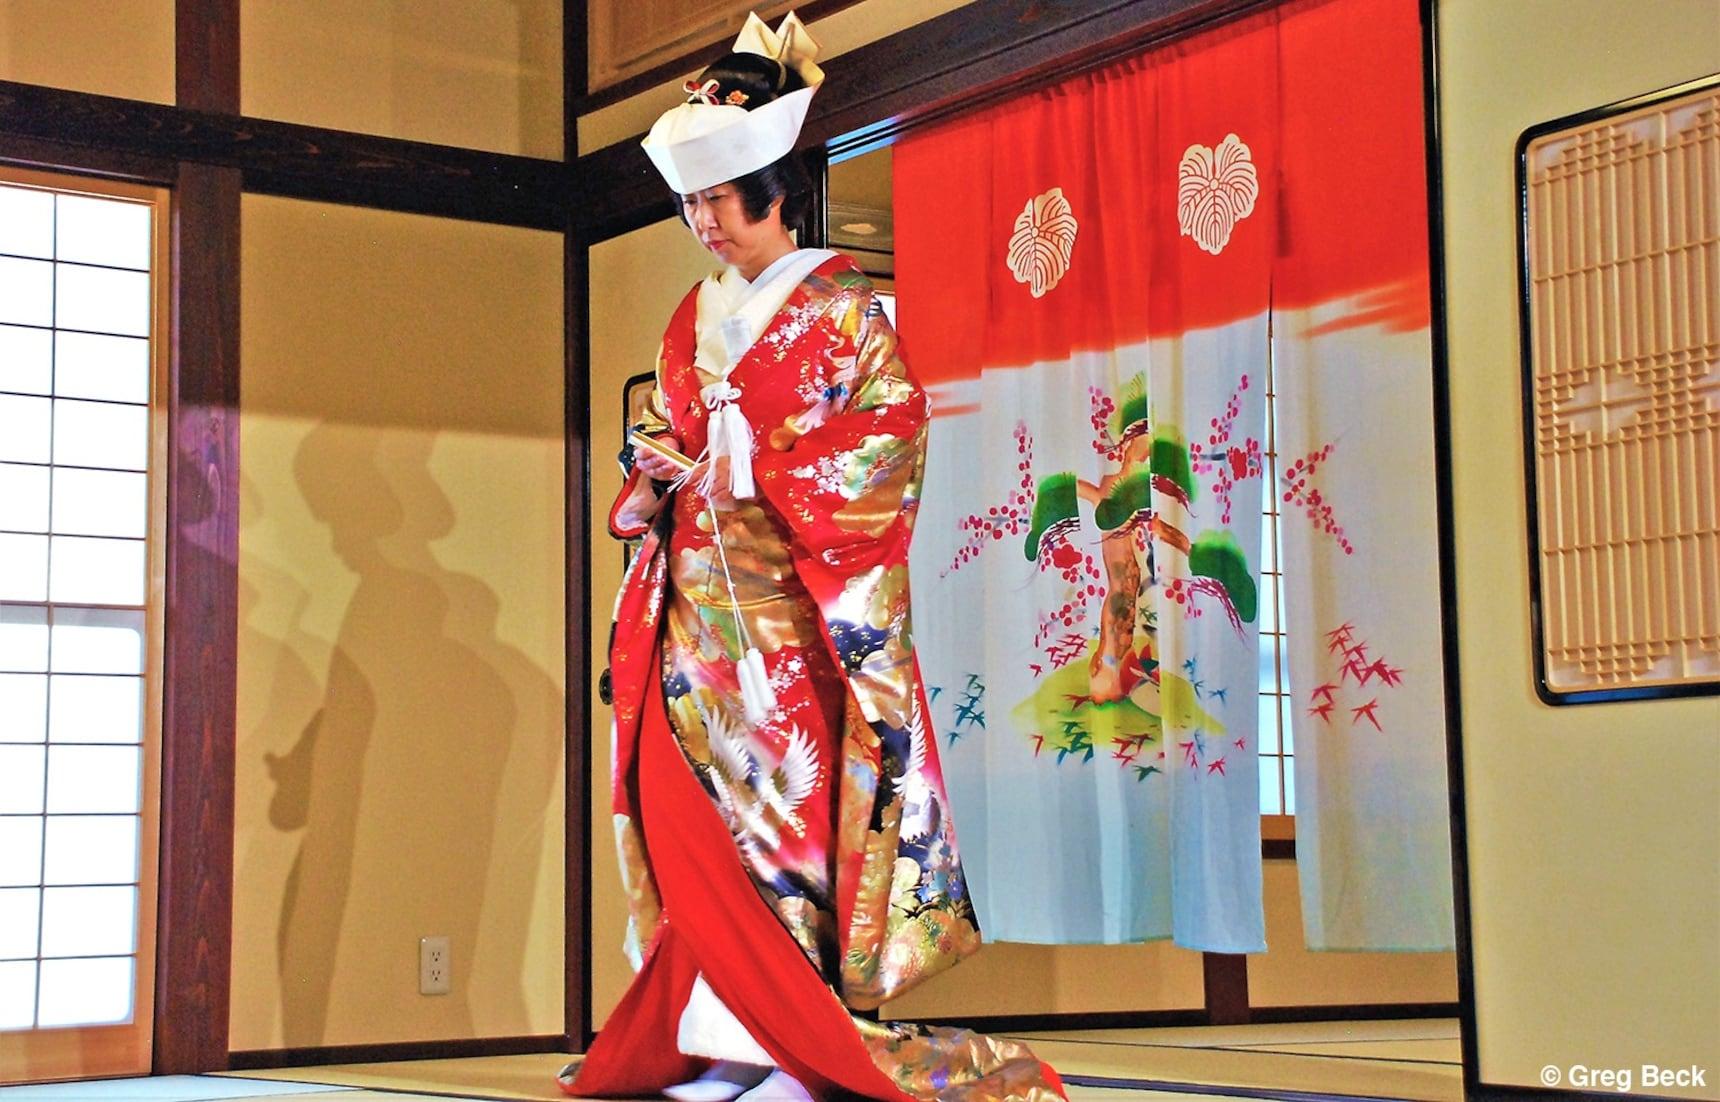 Shoryudo: Enter Japan's Dragon Route